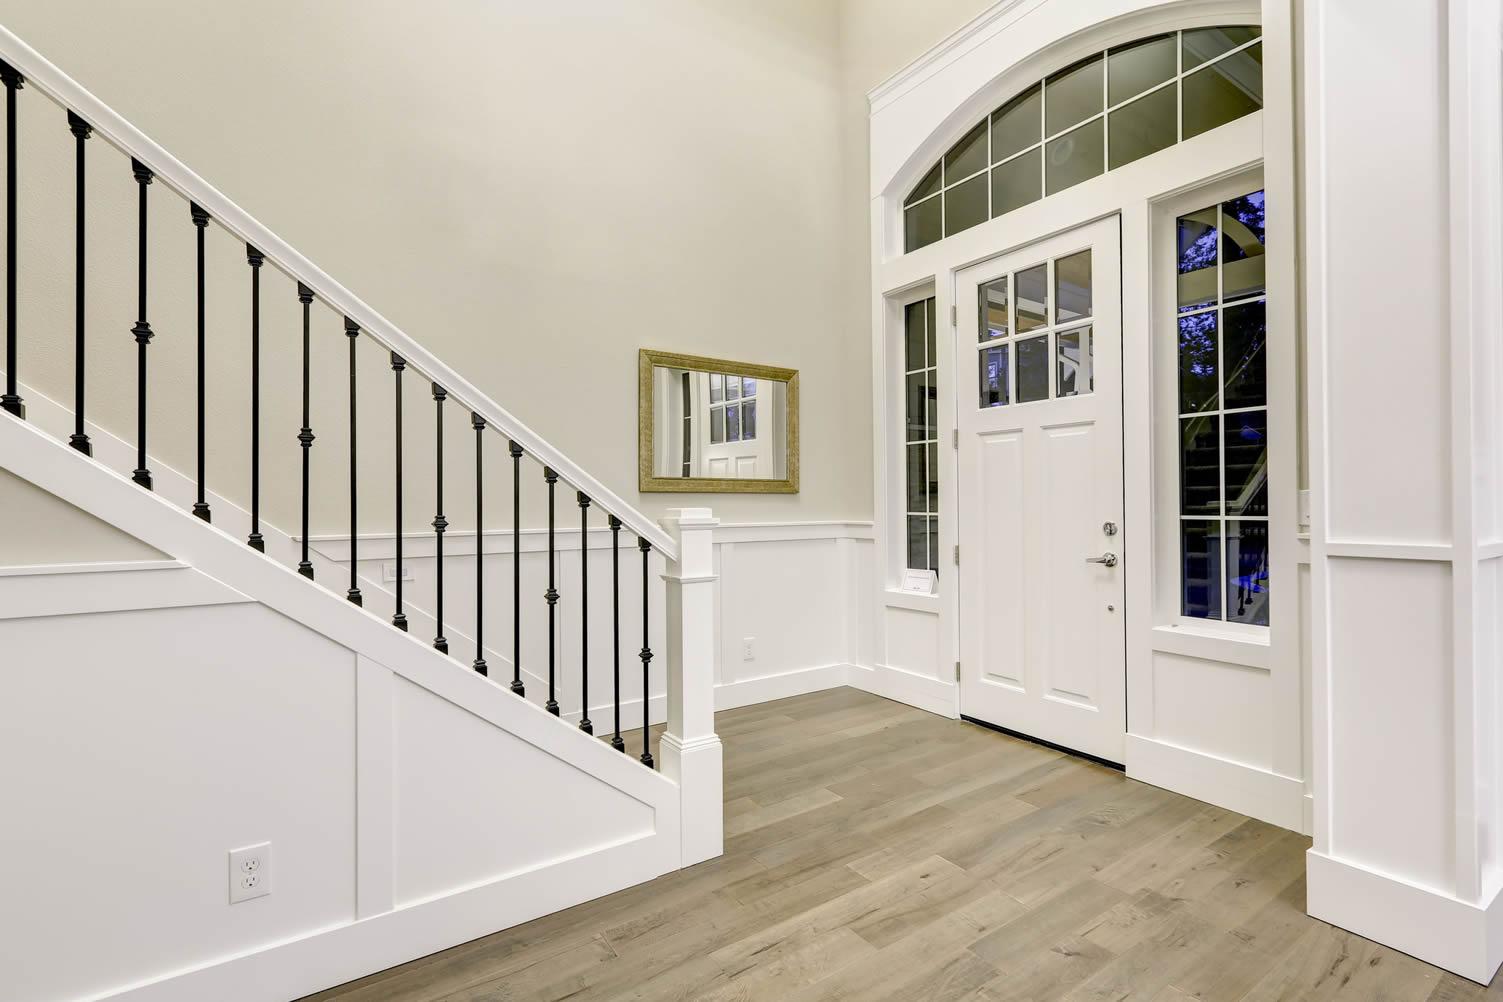 stairway paneled walls